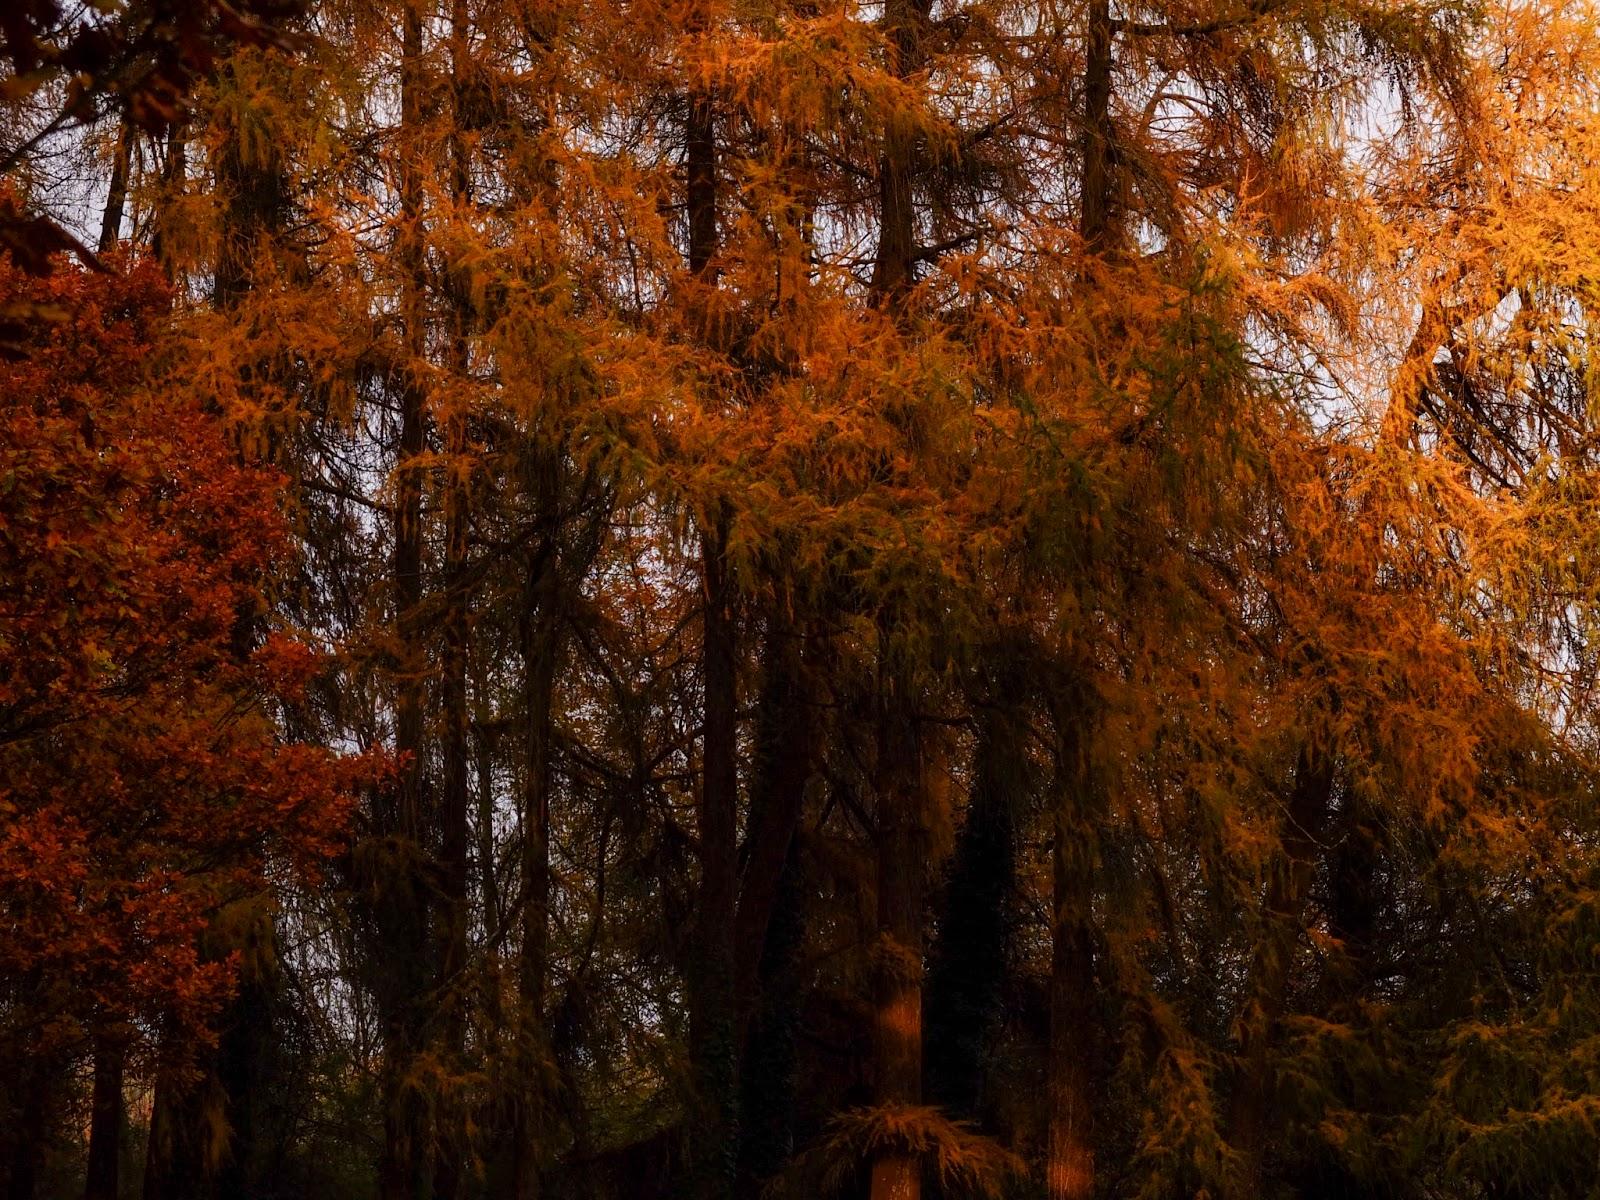 Autumn sunset light shining on conifer trees outside Kanturk Castle in North Cork.